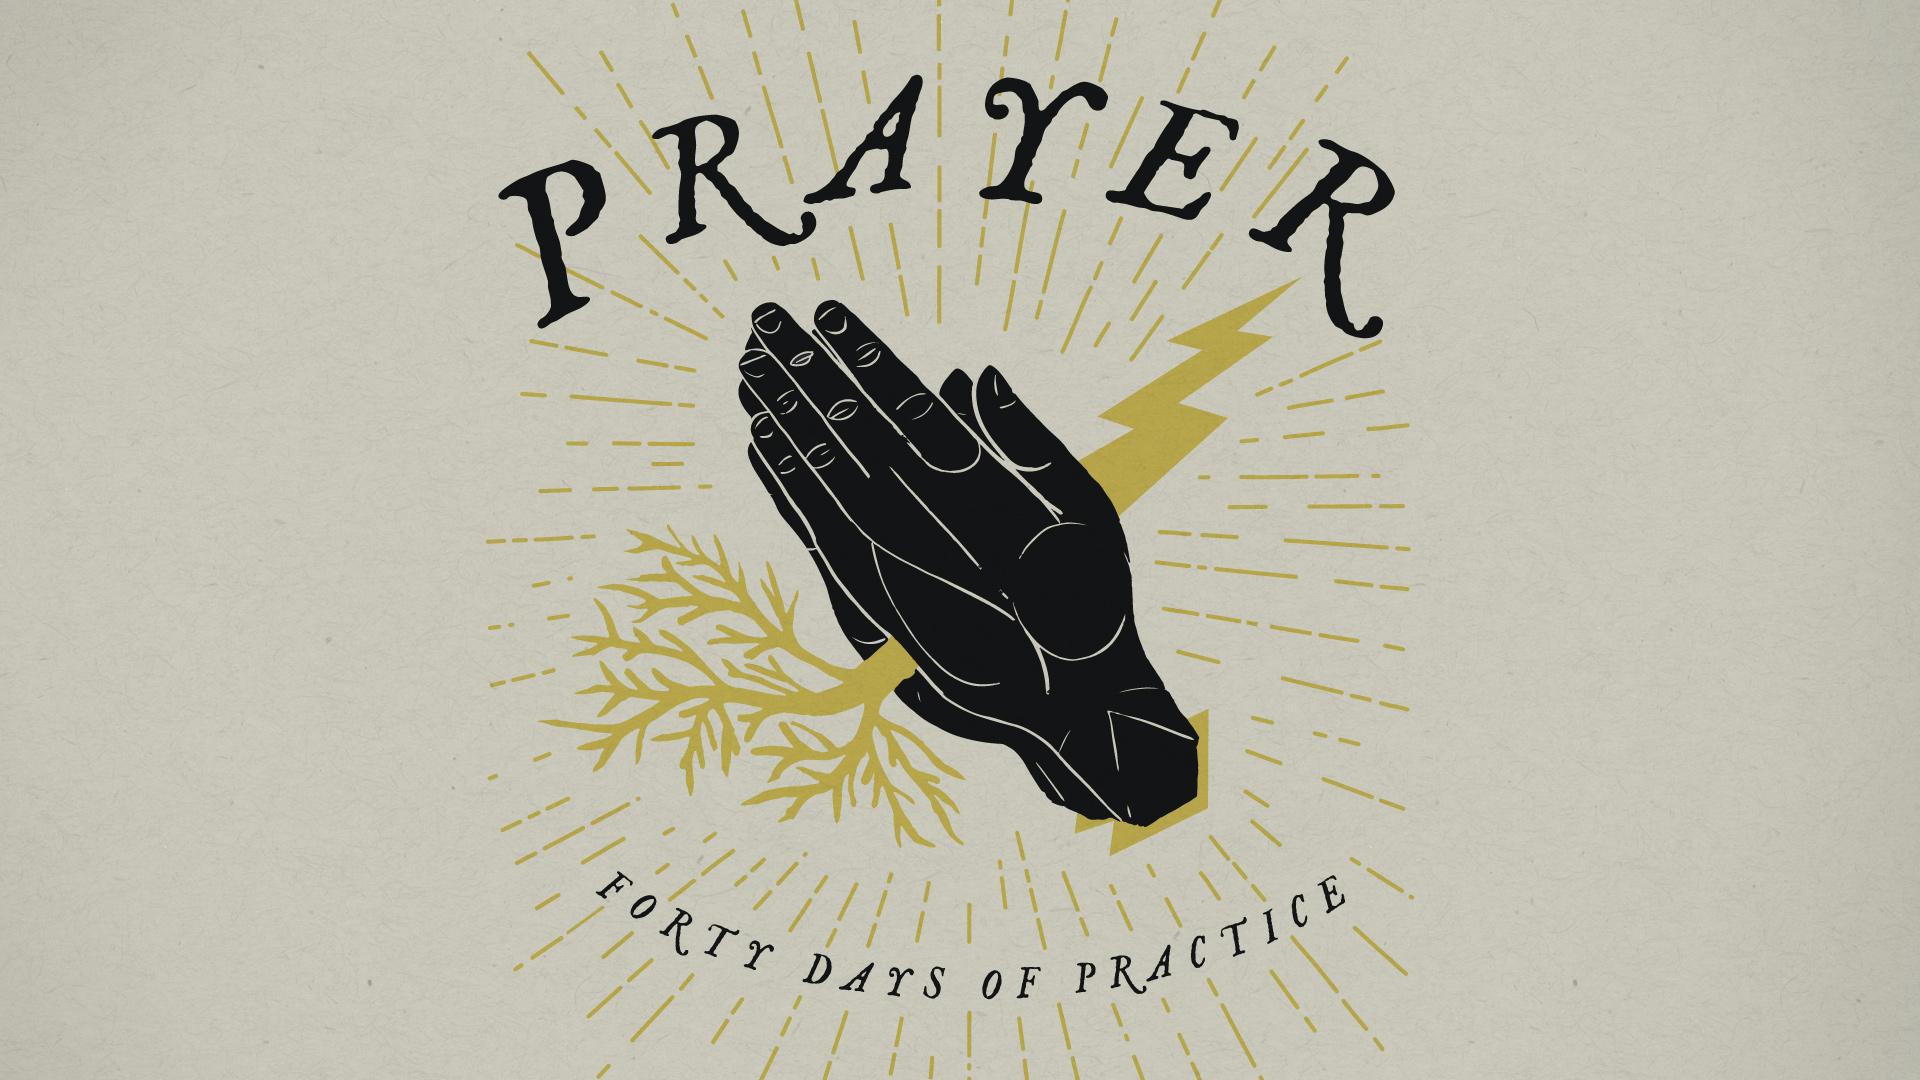 Prayer_Series-Title.jpg